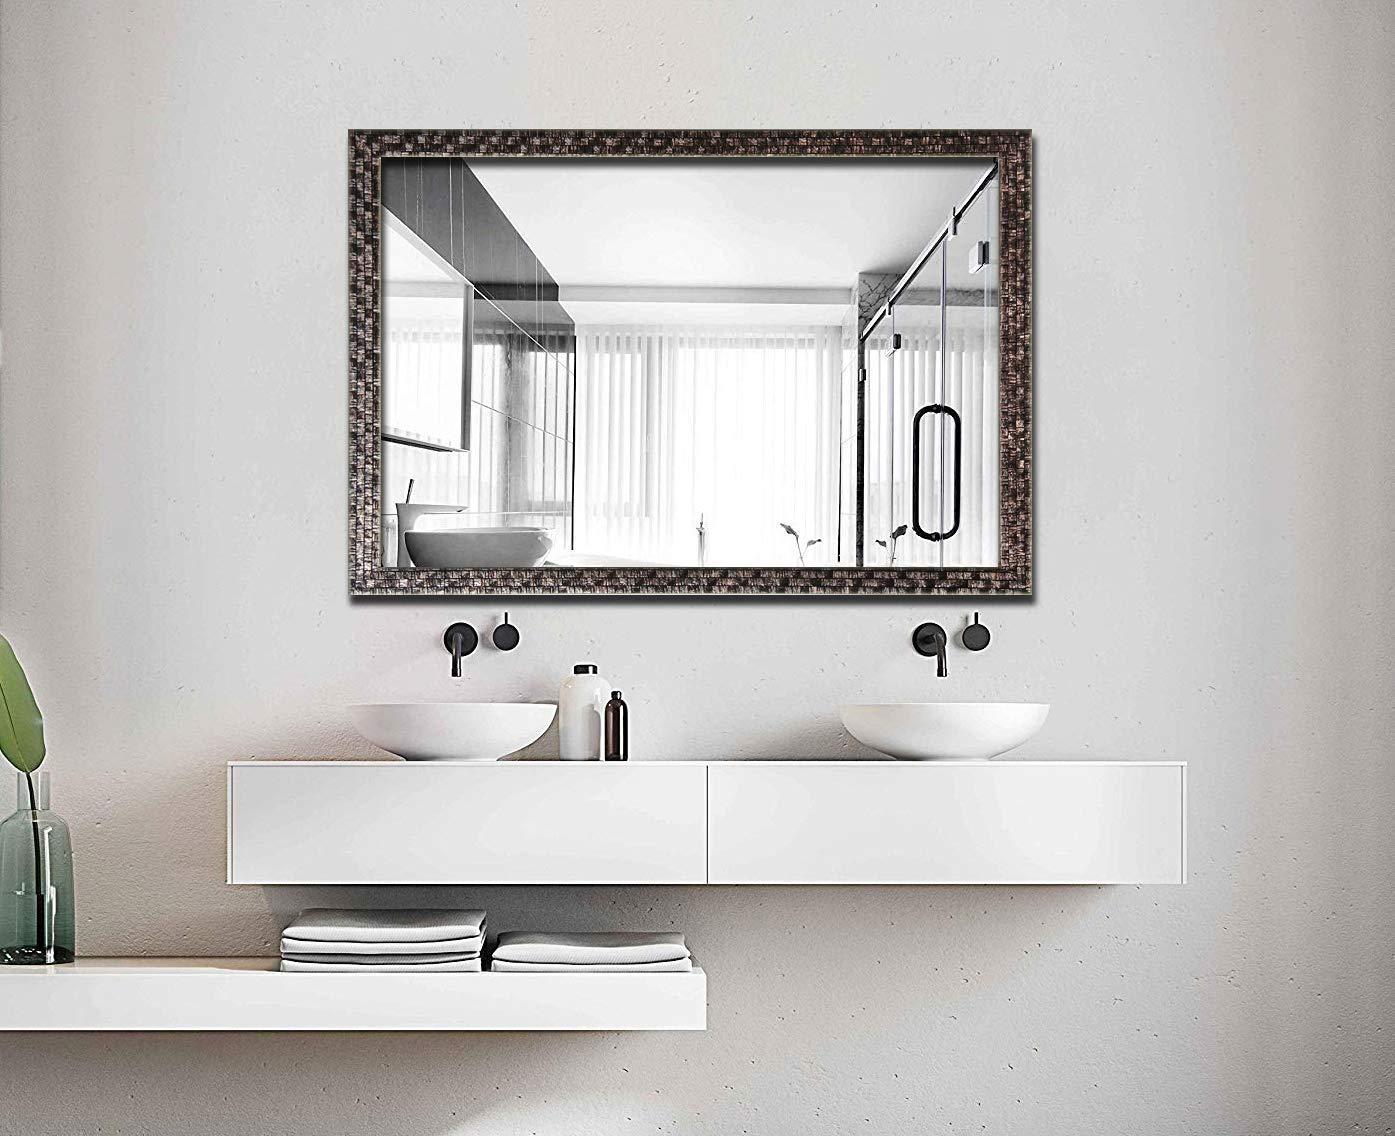 Bathroom Mirrors For Wall Black 32x24 Home Decor Home Kitchen Fcteutonia05 De